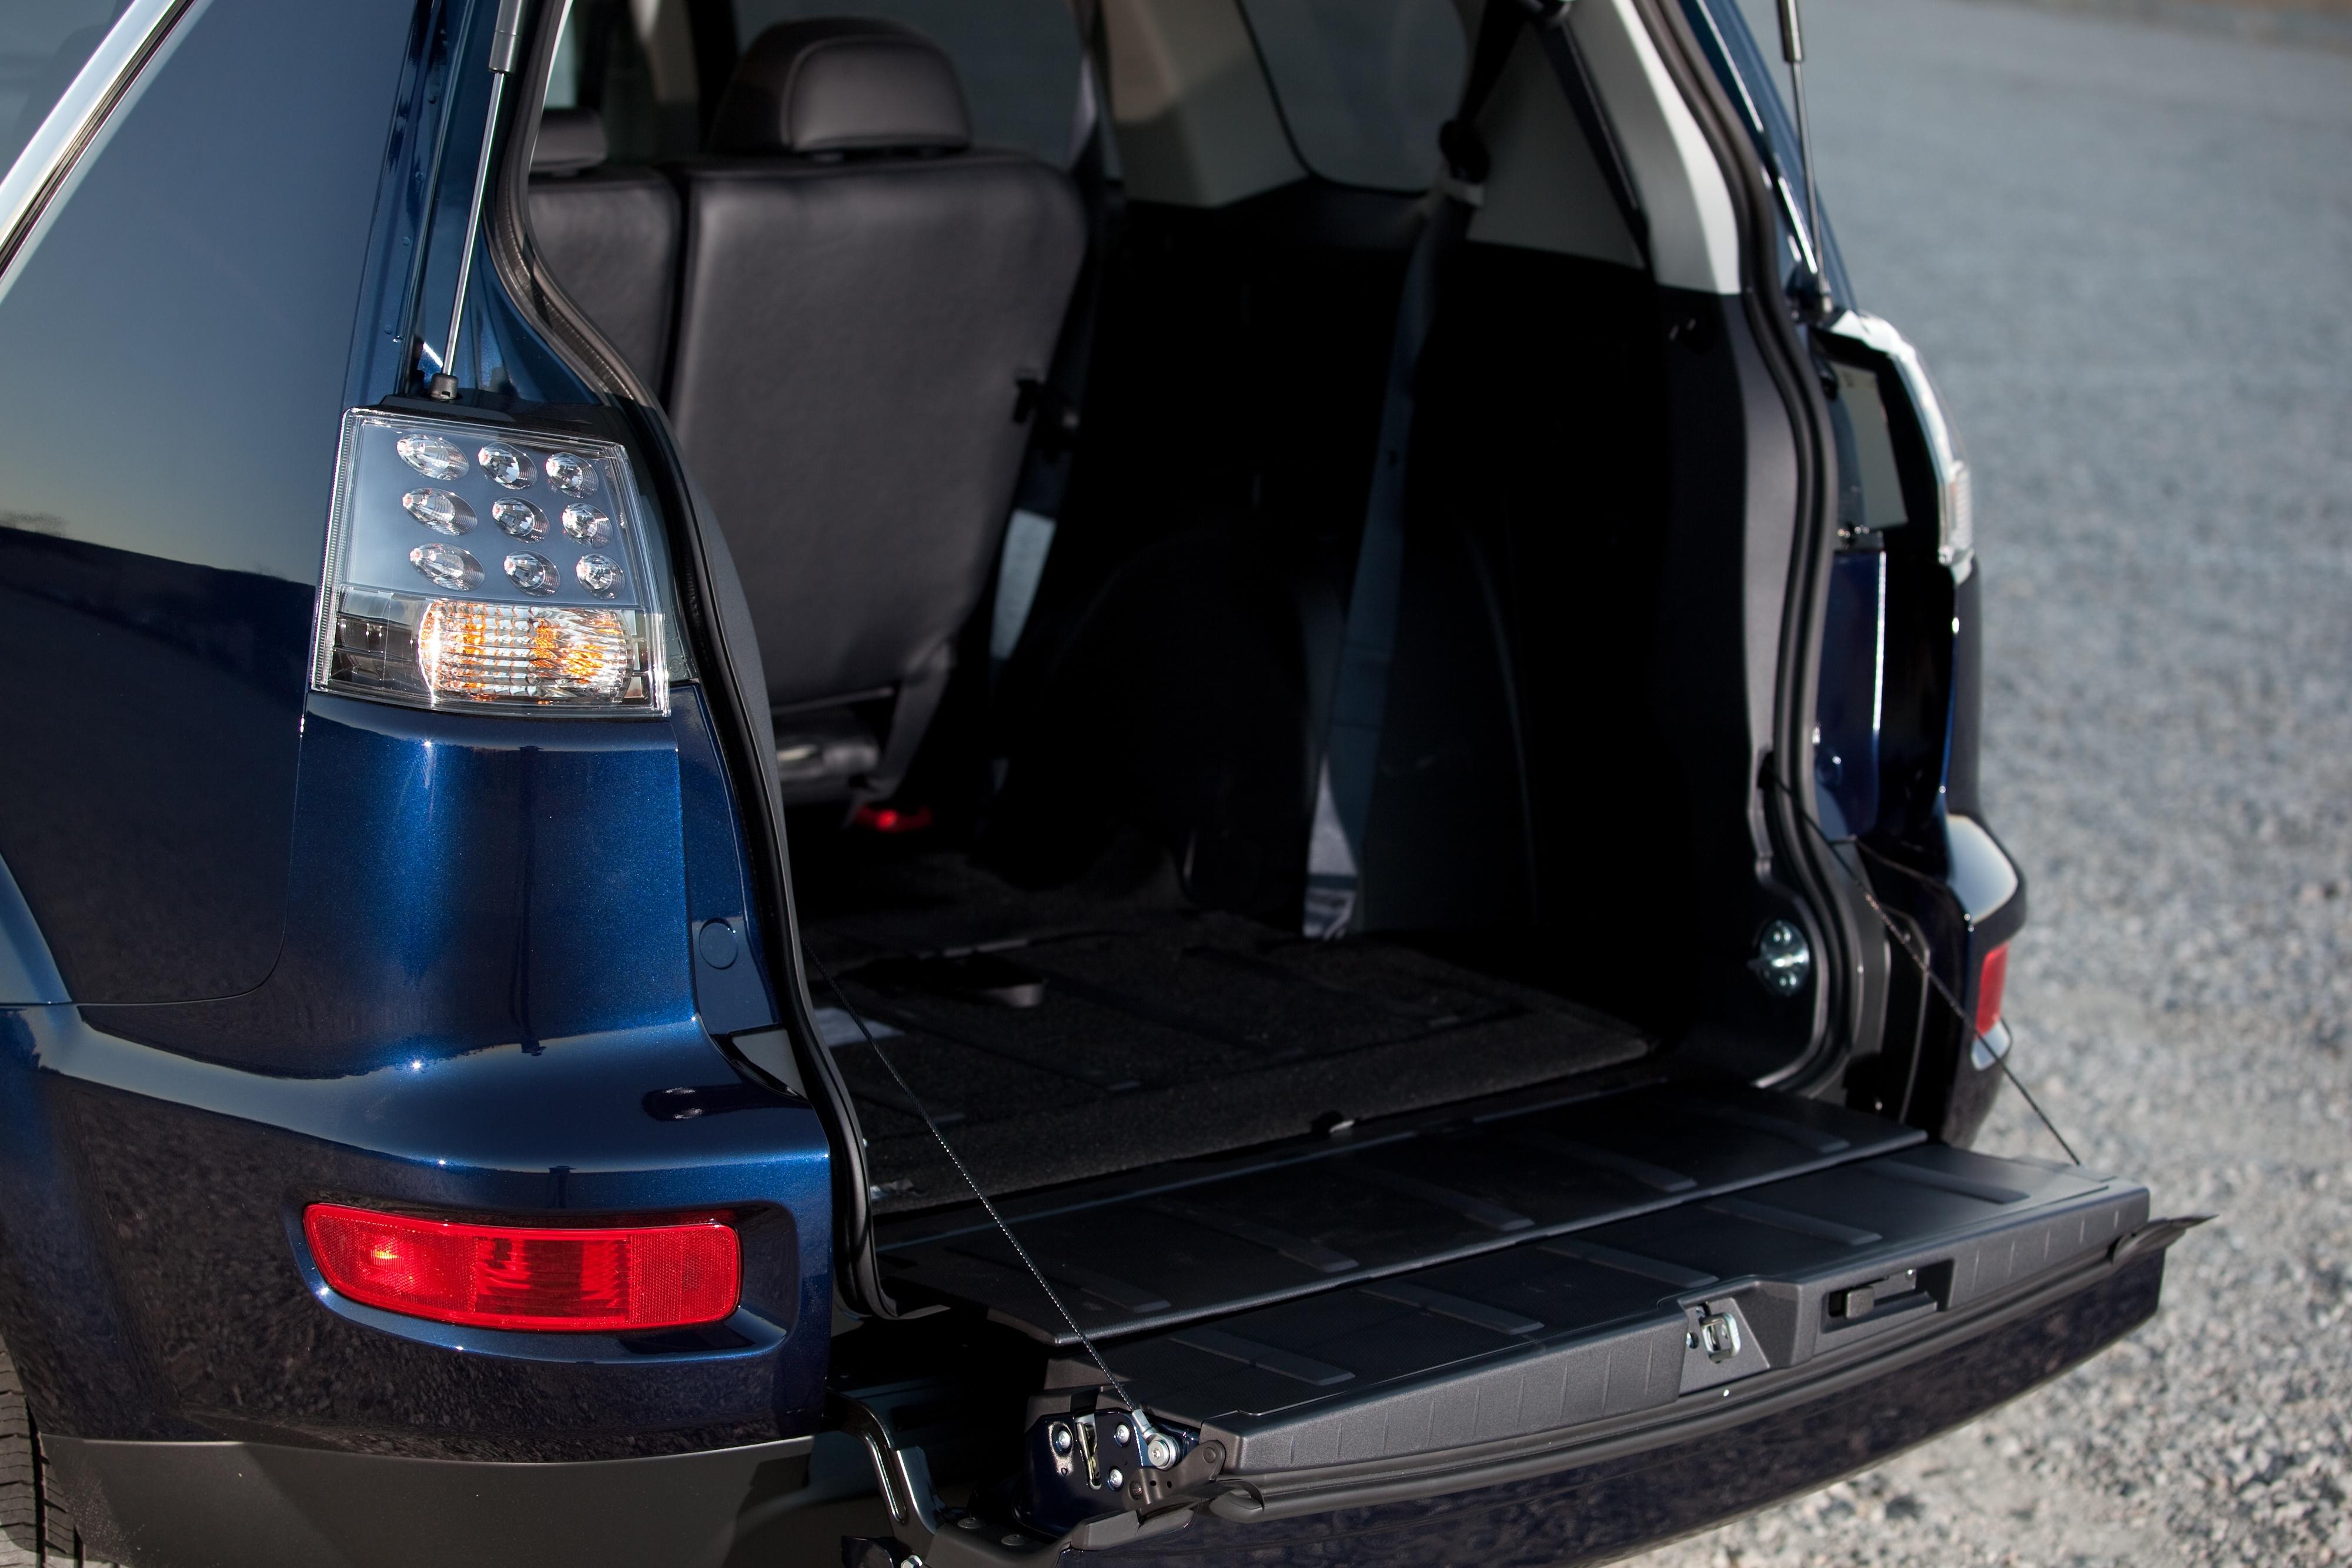 Mitsubishi outlander 2011 problems